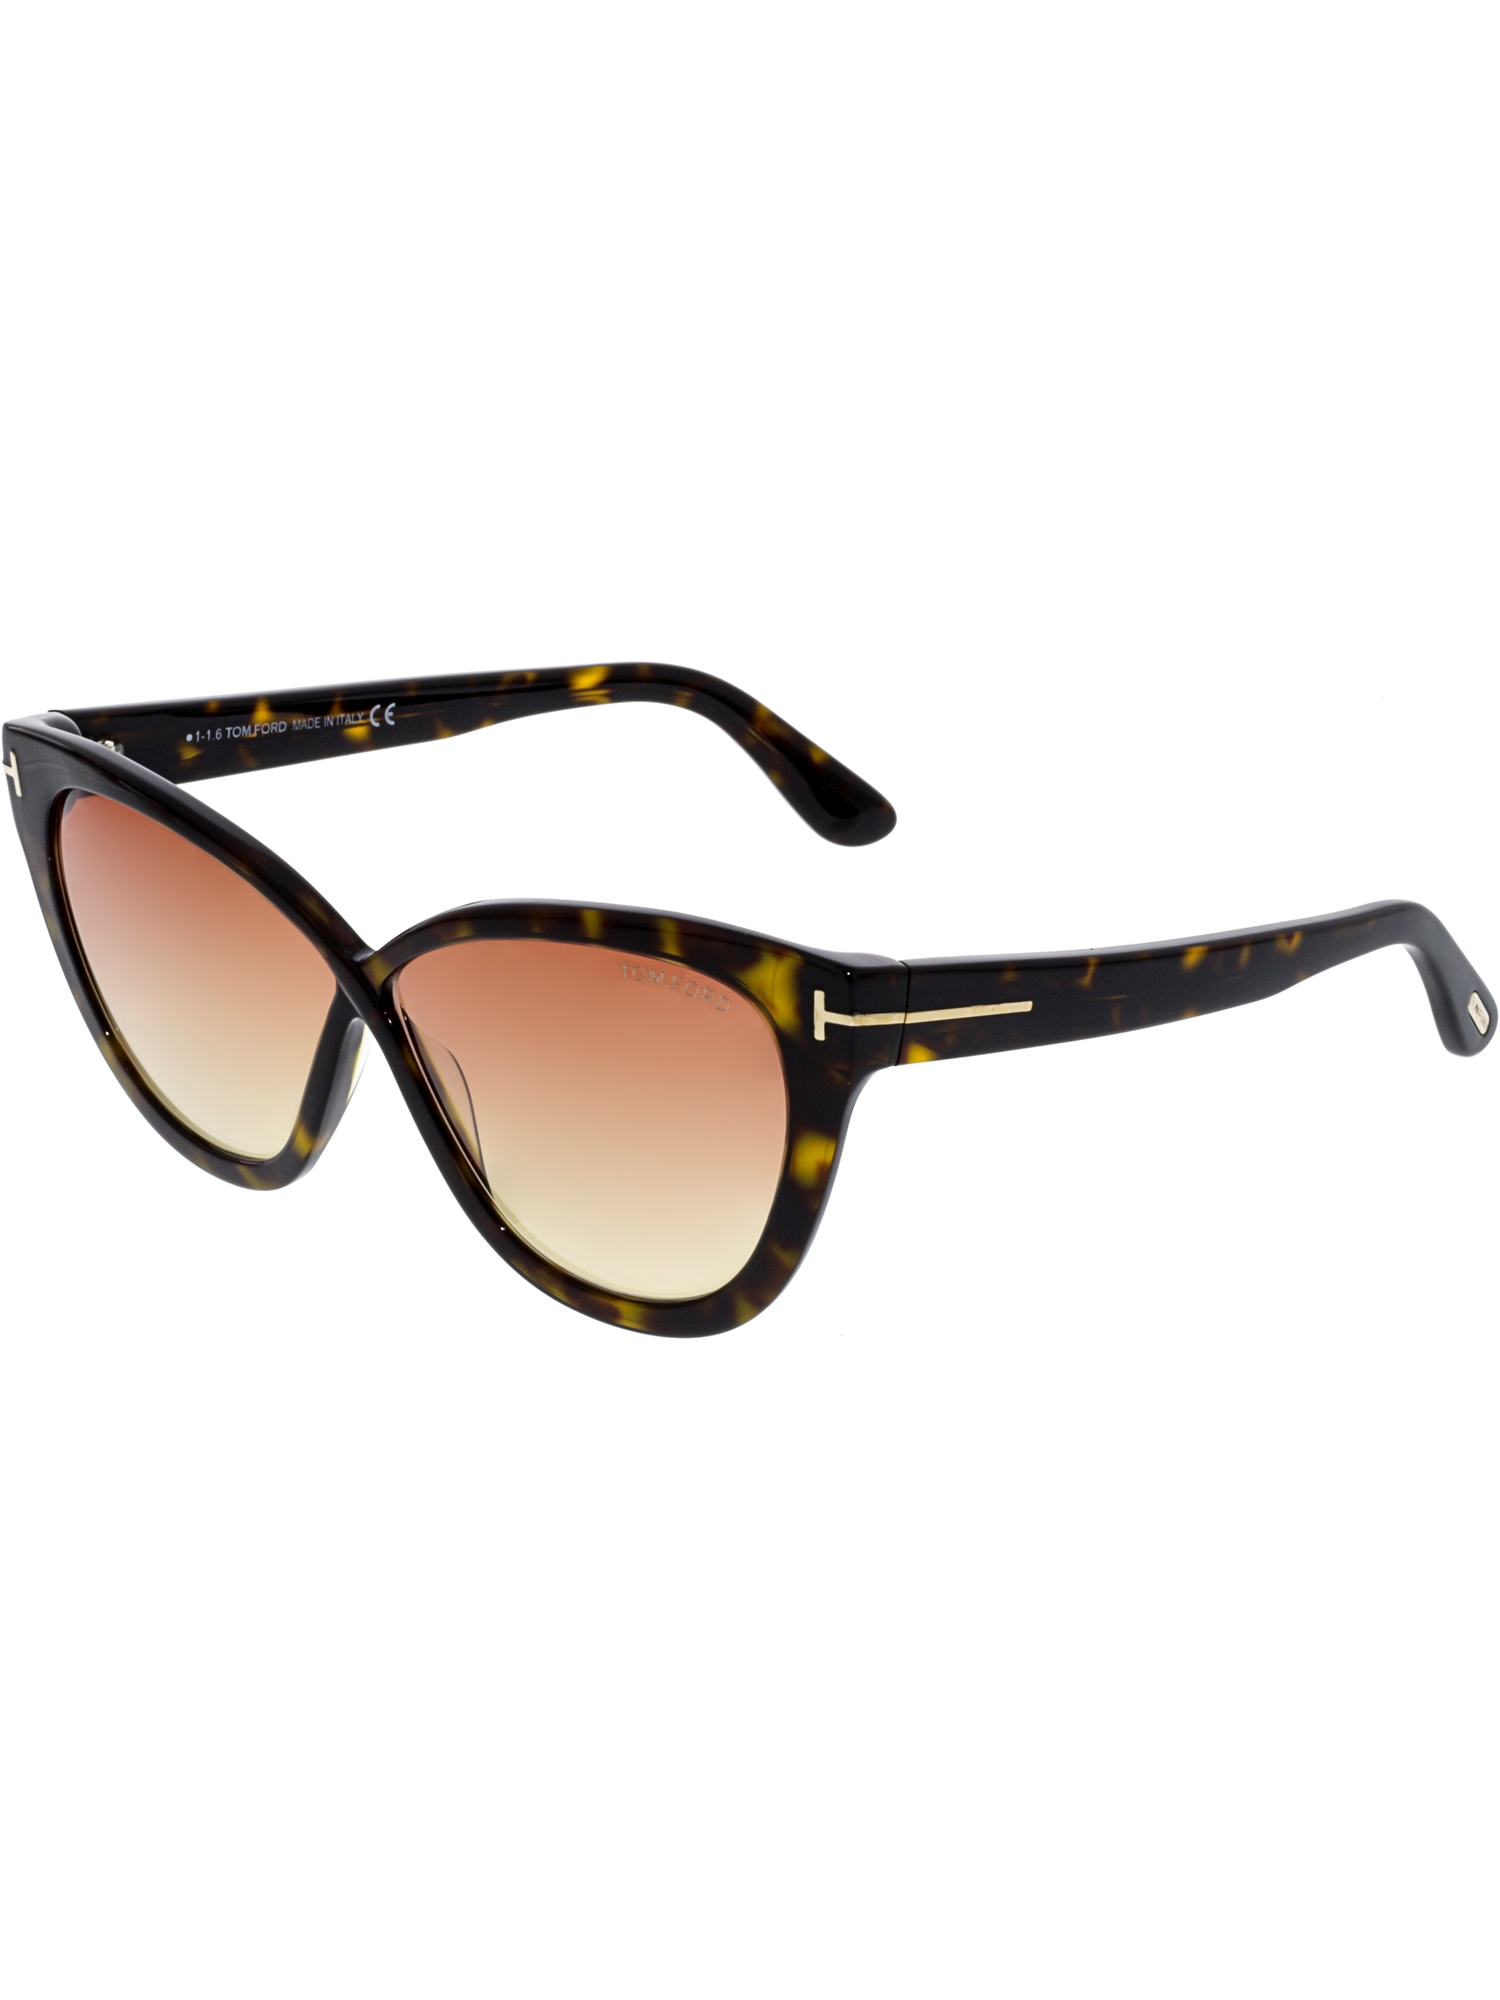 ec7045cc1c6 Tom Ford Women s Arabella FT0511-52B-59 Brown Cat Eye Sunglasses